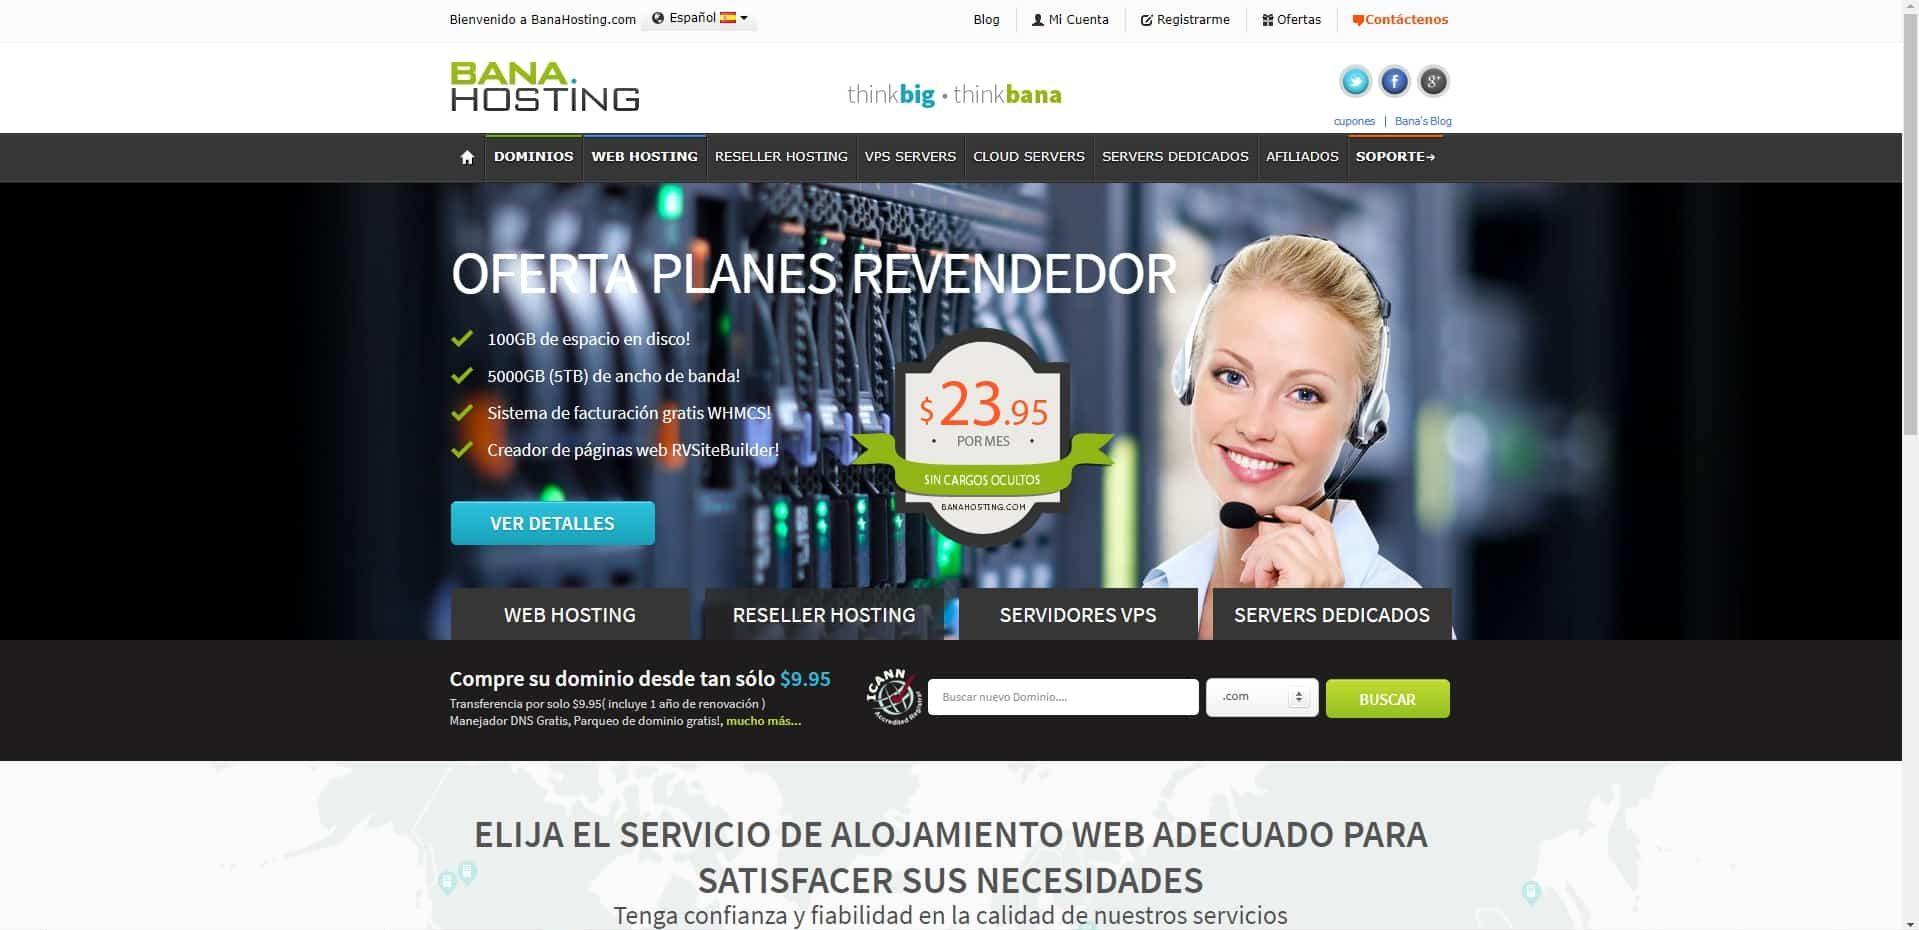 banahosting web